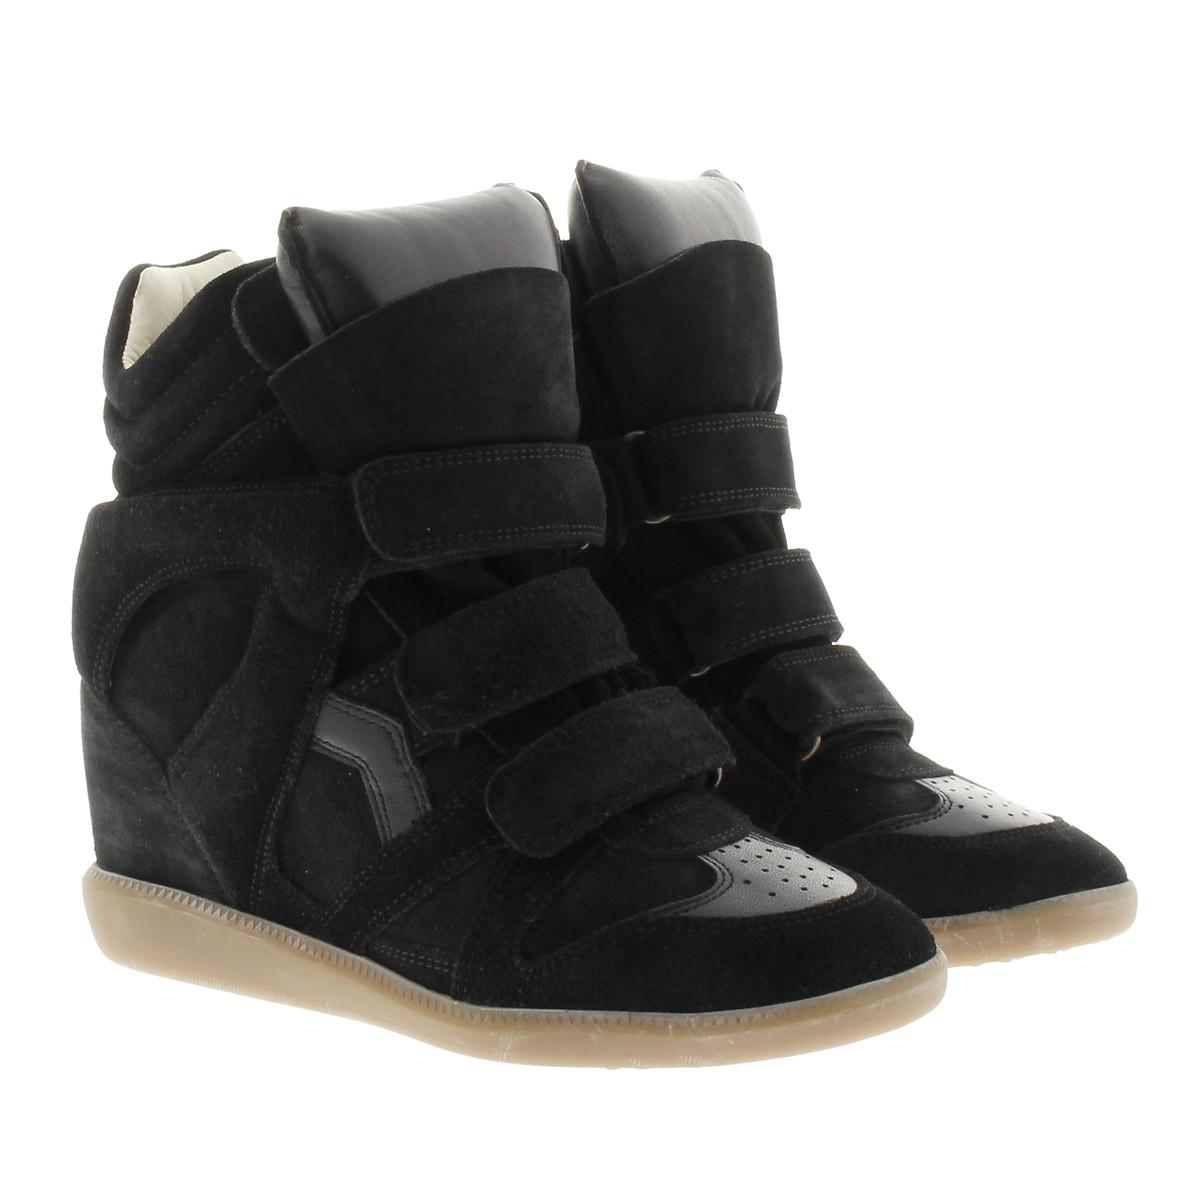 Isabel Marant Sneakers - Bekett Sneaker Suede Black - in schwarz - für Damen